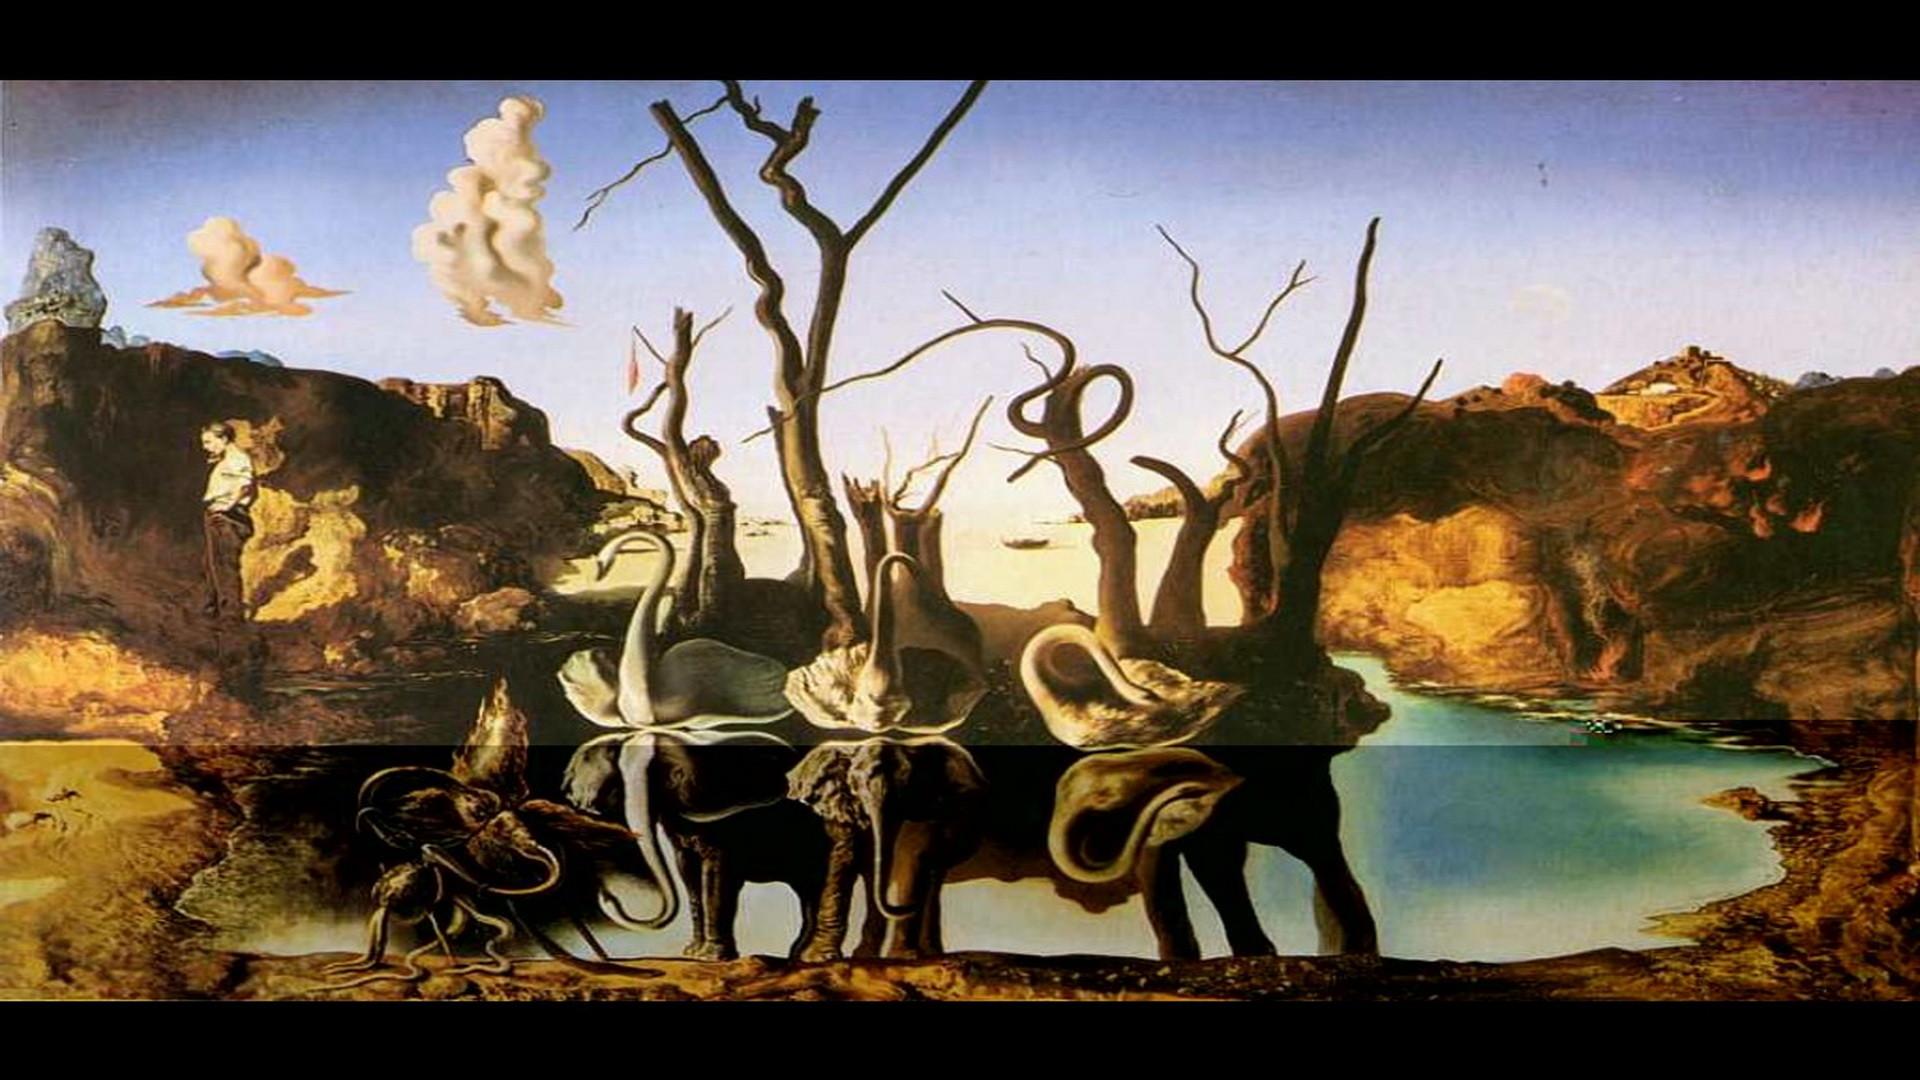 Artwork by Salvador Dali | Salvador Dalí Wallpaper – Swans Reflecting  Elephants